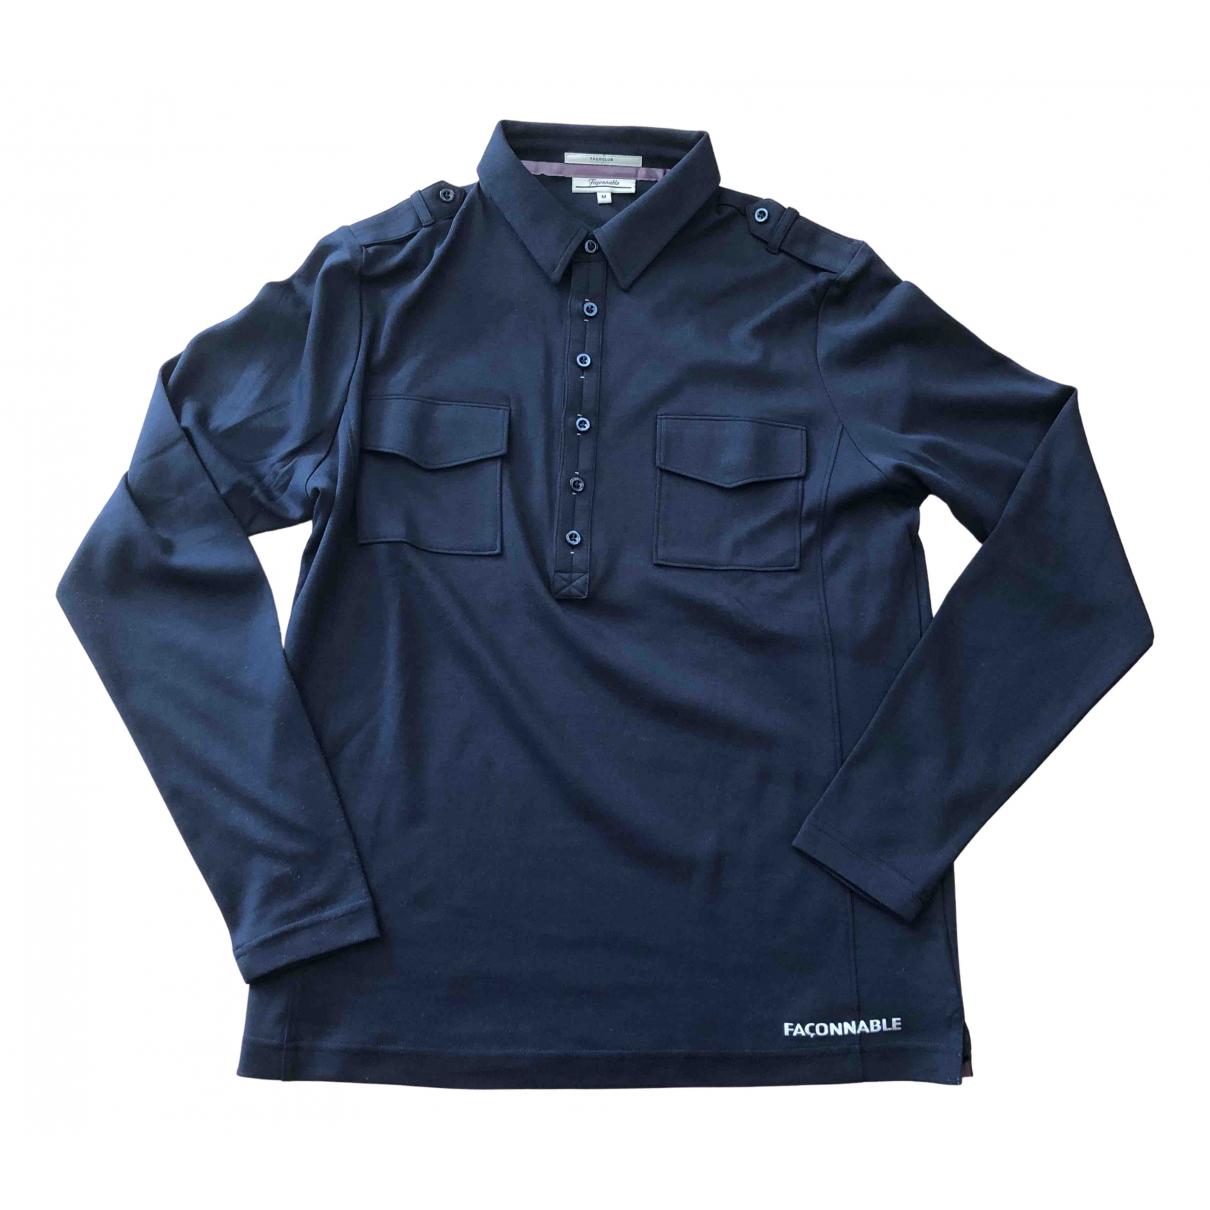 Faconnable \N Poloshirts in  Blau Baumwolle